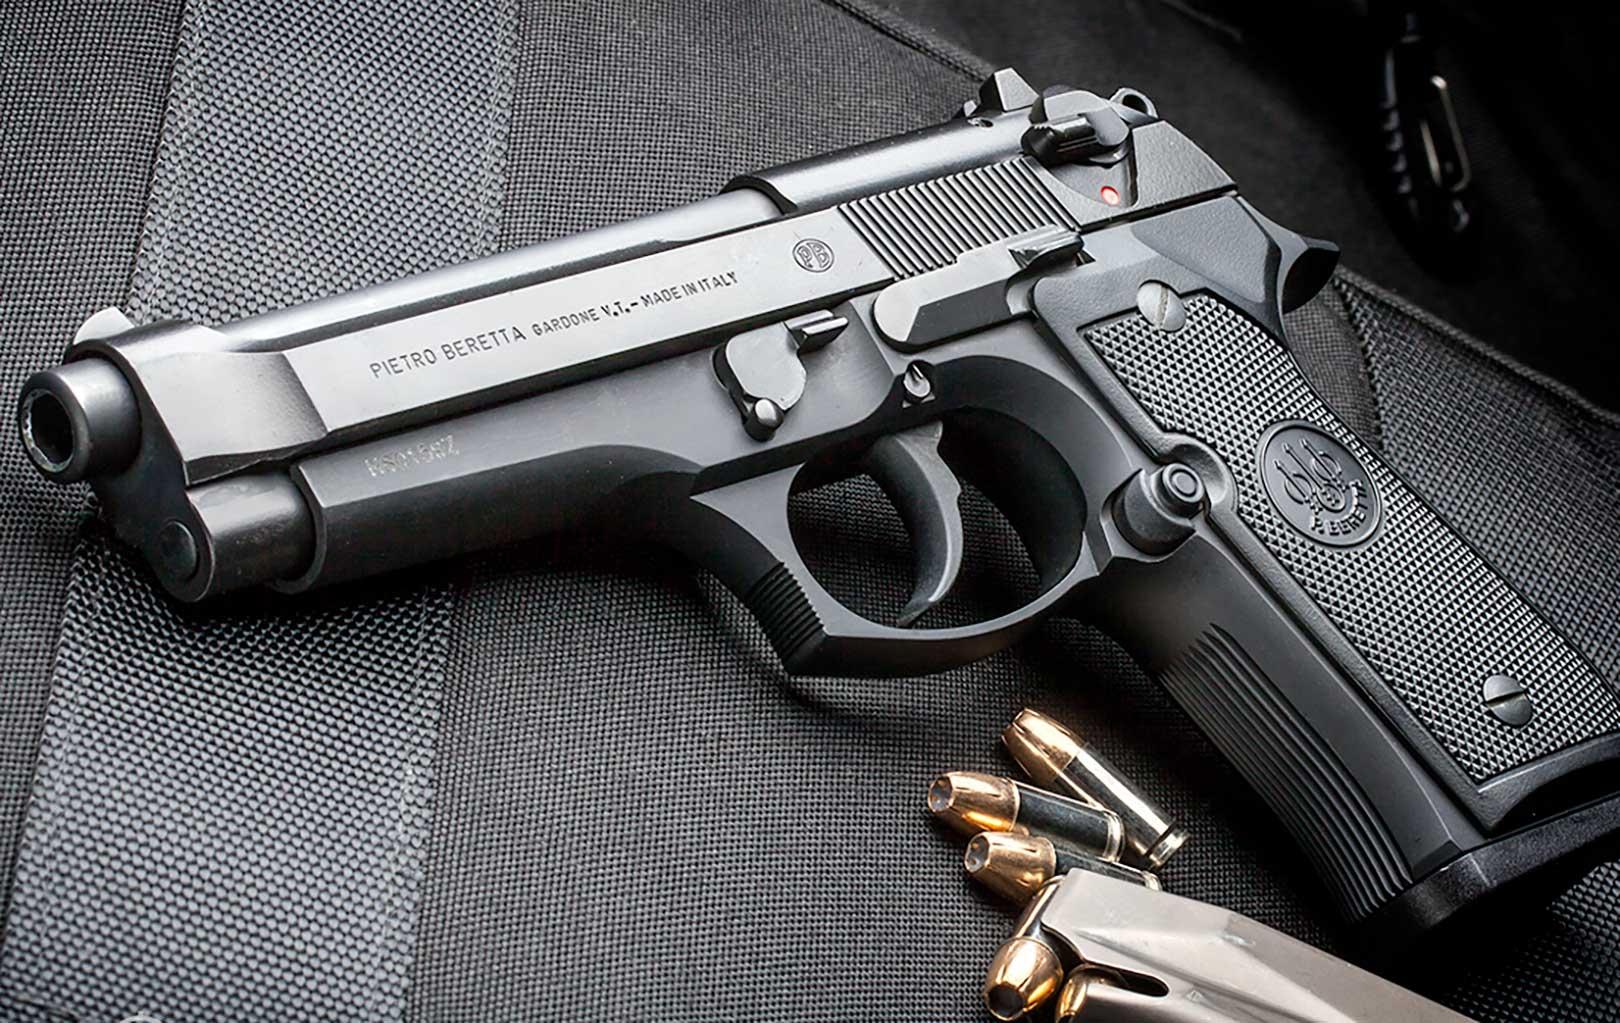 Beretta 92 fs polizia